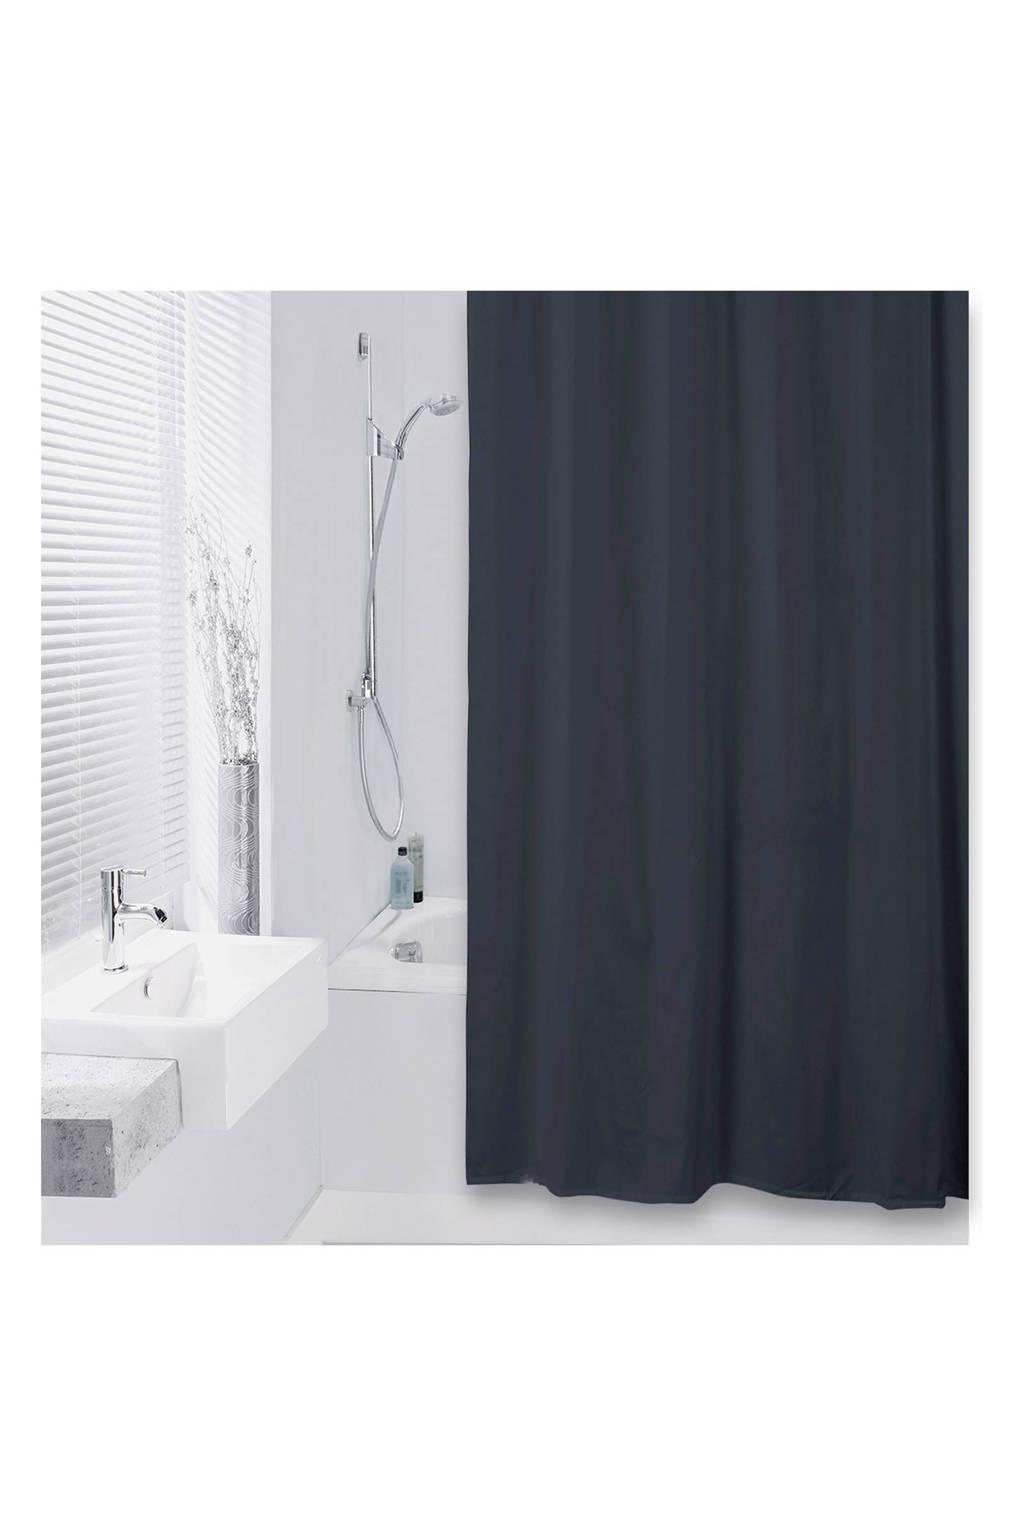 Differnz Color douchegordijn 180x200cm, Zwart